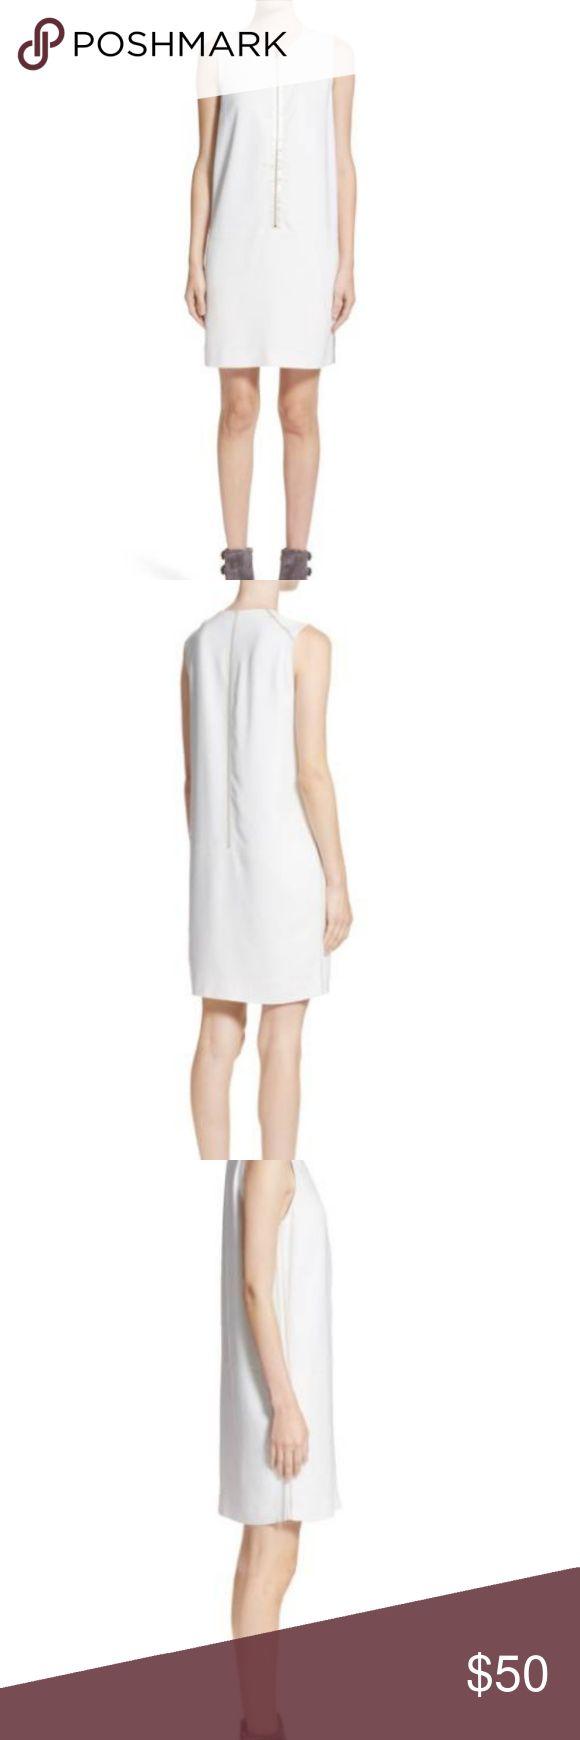 Rag And Bone Gabriela White Sleeveless Zip Dress